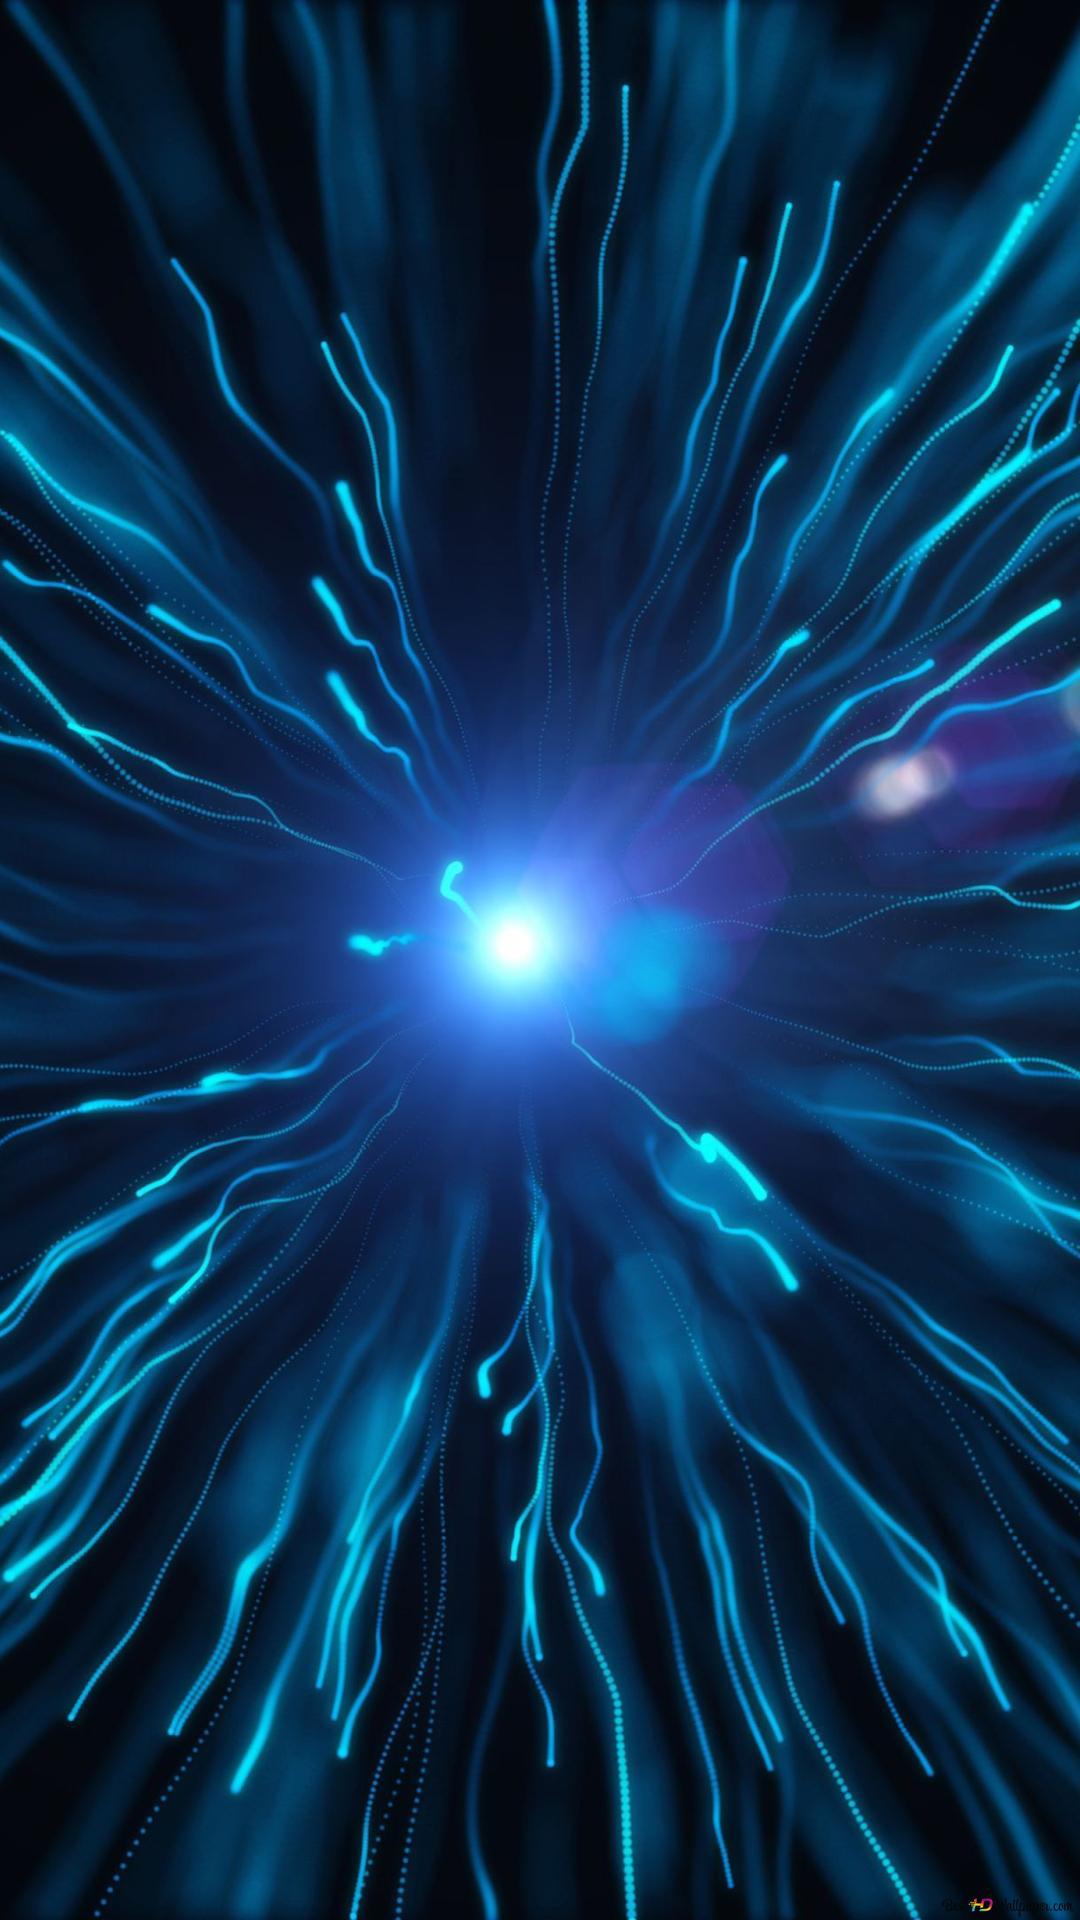 abstrak biru partikel wallpaper 1080x1920 12003 165